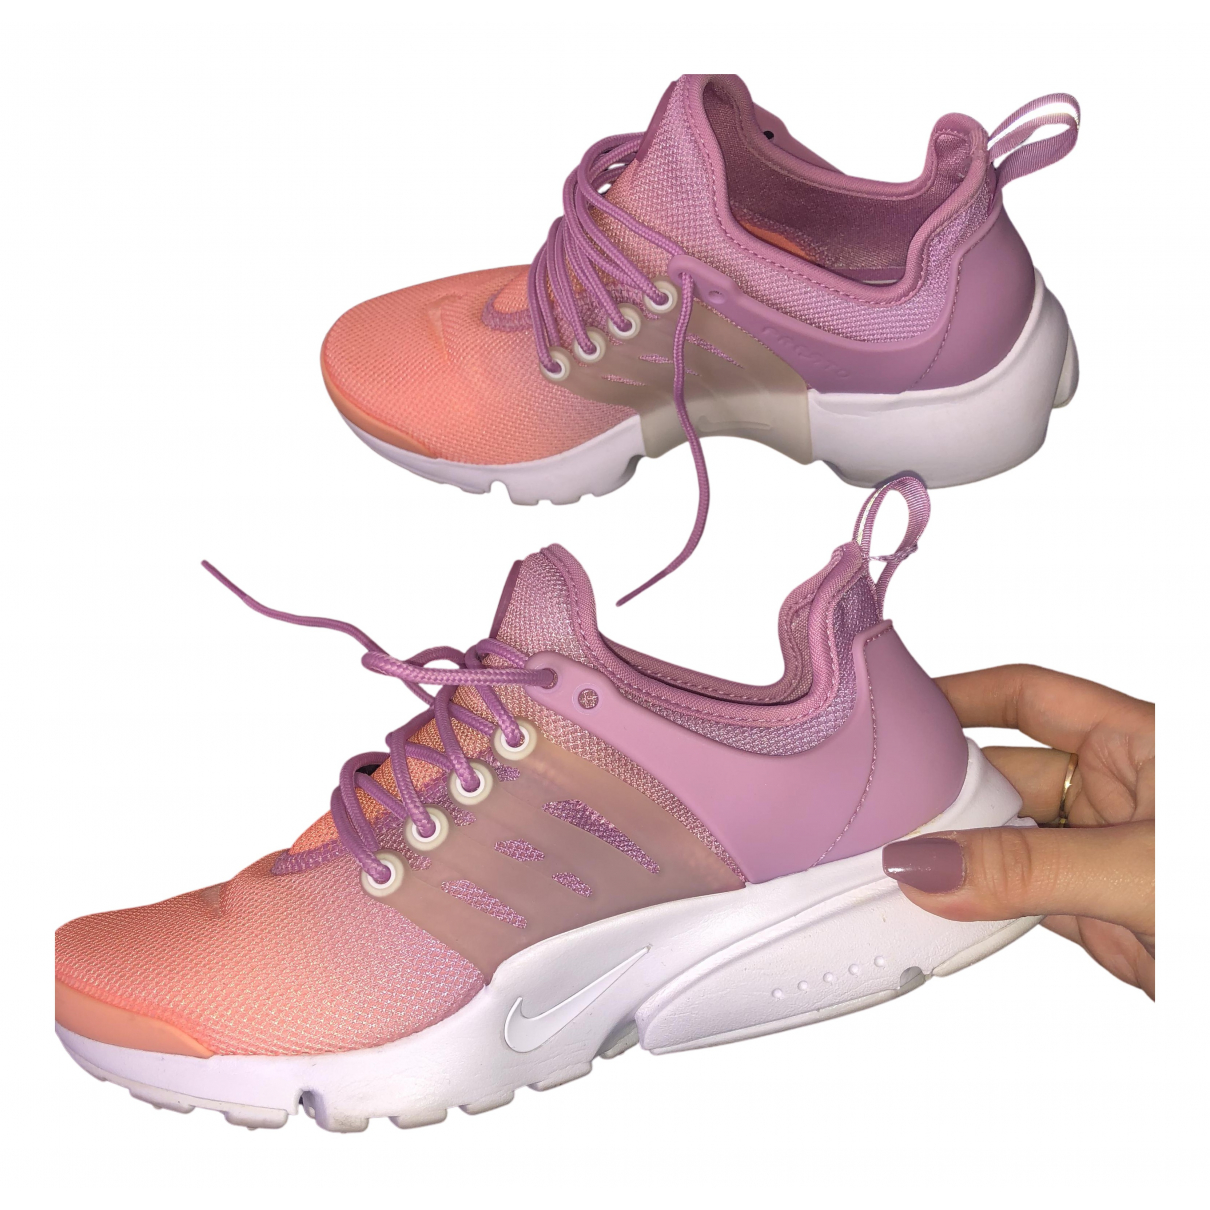 Deportivas Air Presto de Lona Nike